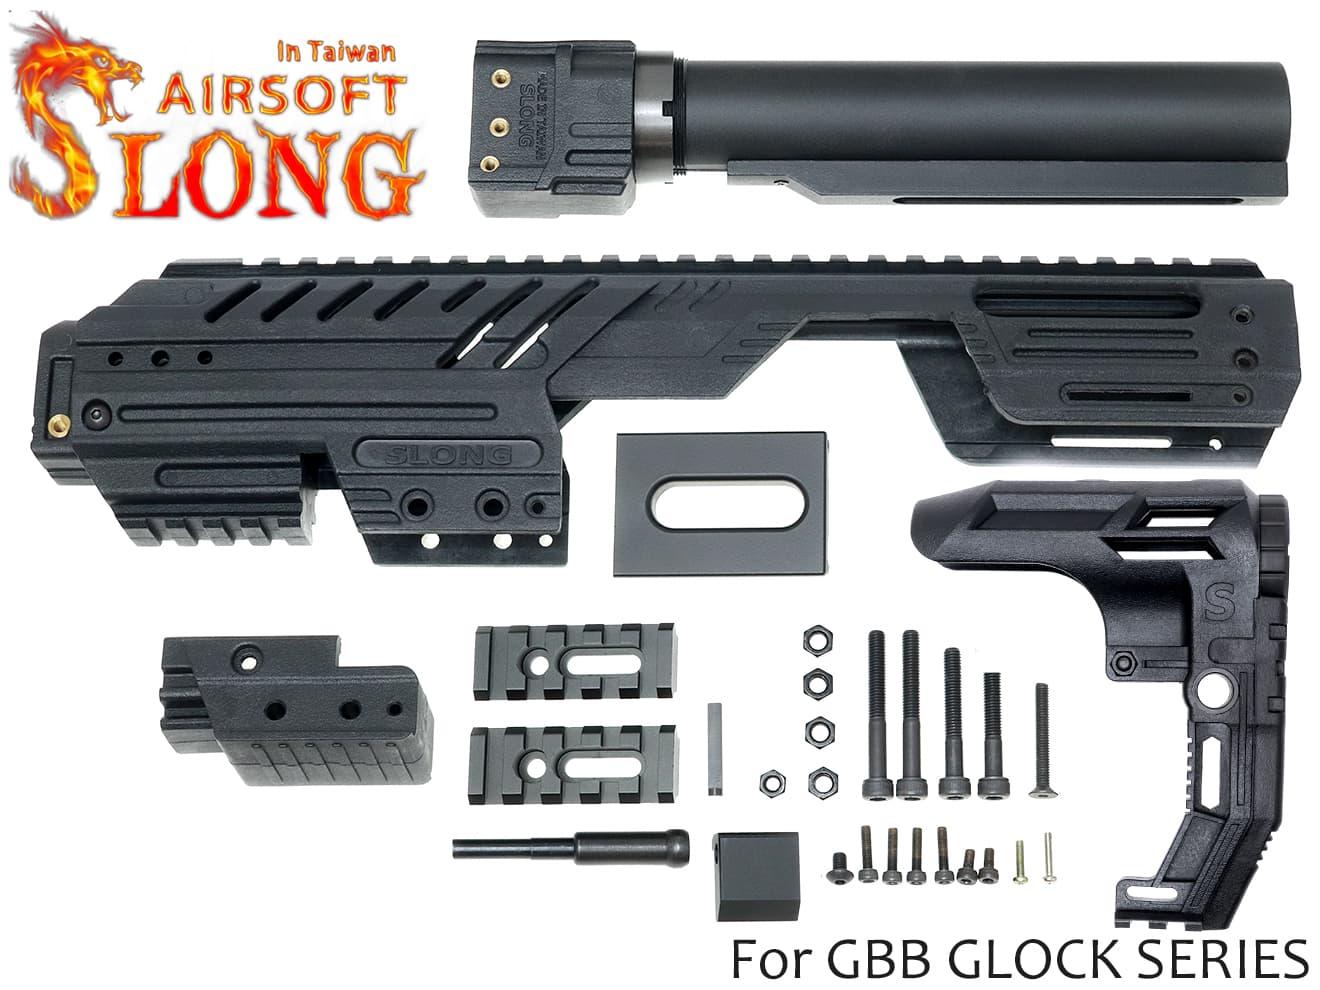 SLONG AIRSOFT MPG-KRISS コンバージョンキット for G17/G18C/G22/G34◆グロックシリーズを瞬時にPDW化 SMG 軽量 取り回し◎ CQCに